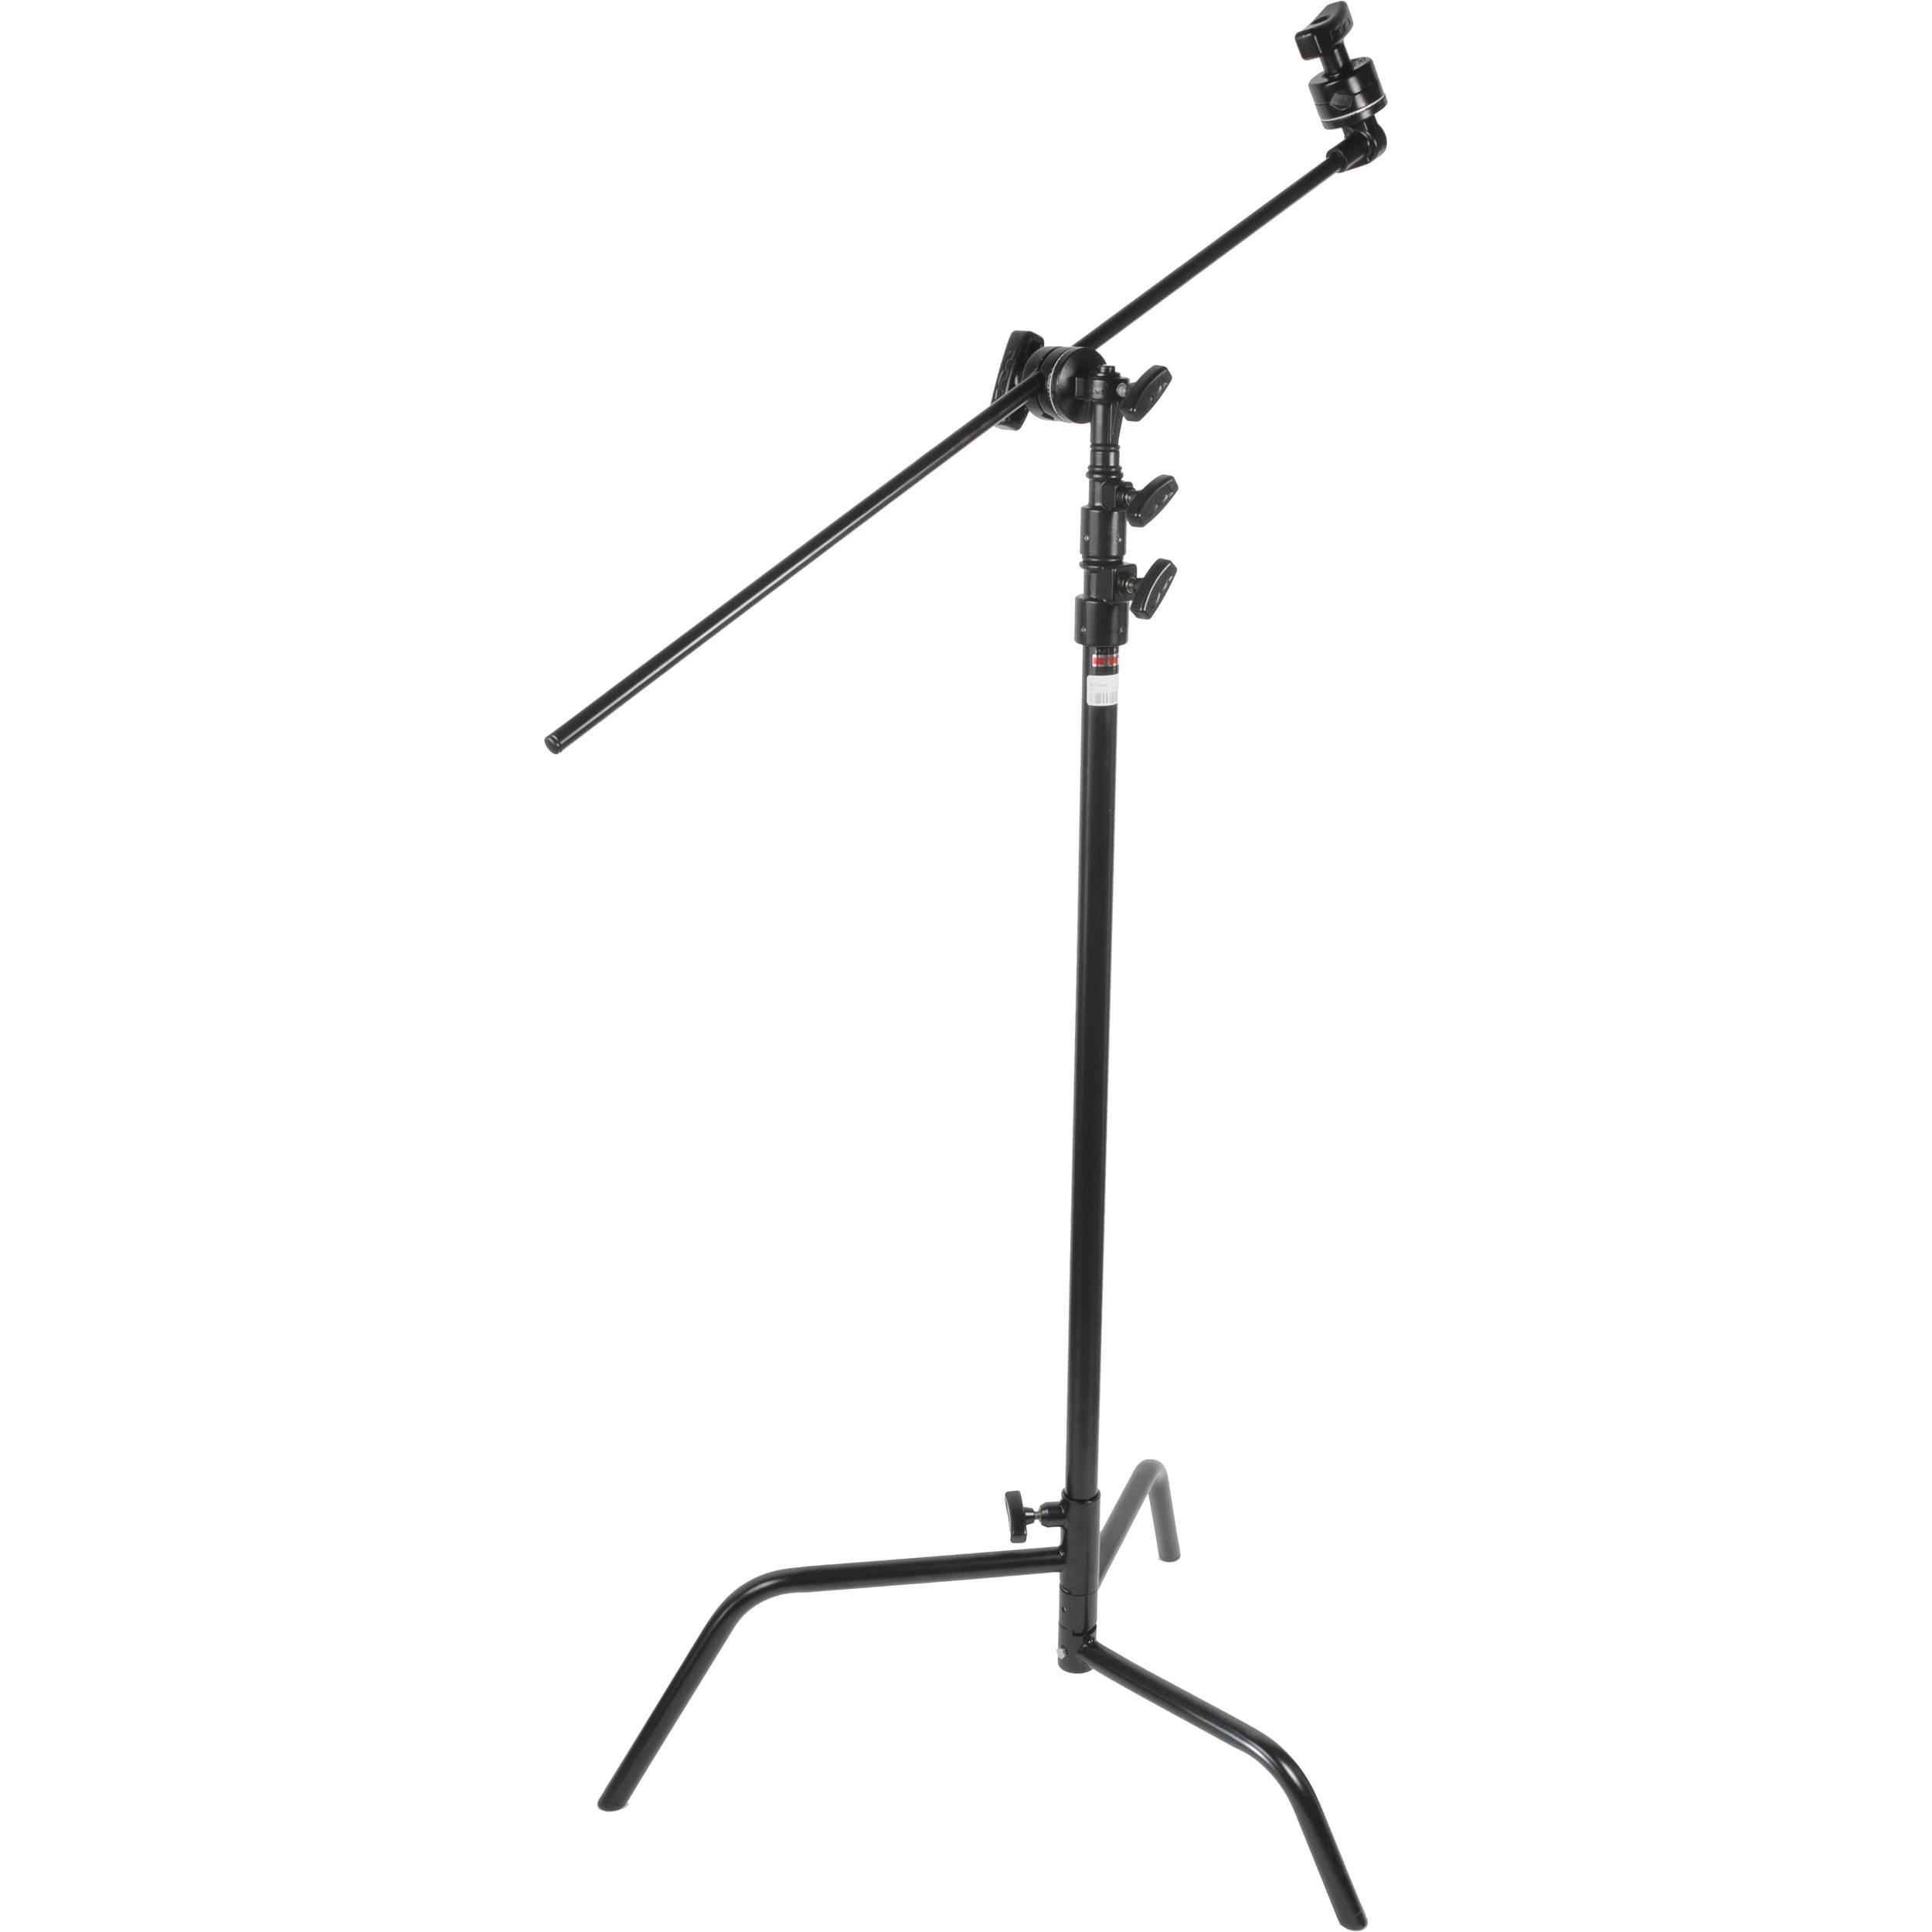 Matthews C Stand Grip Head Kit Black 10 5 B756040 B Amp H